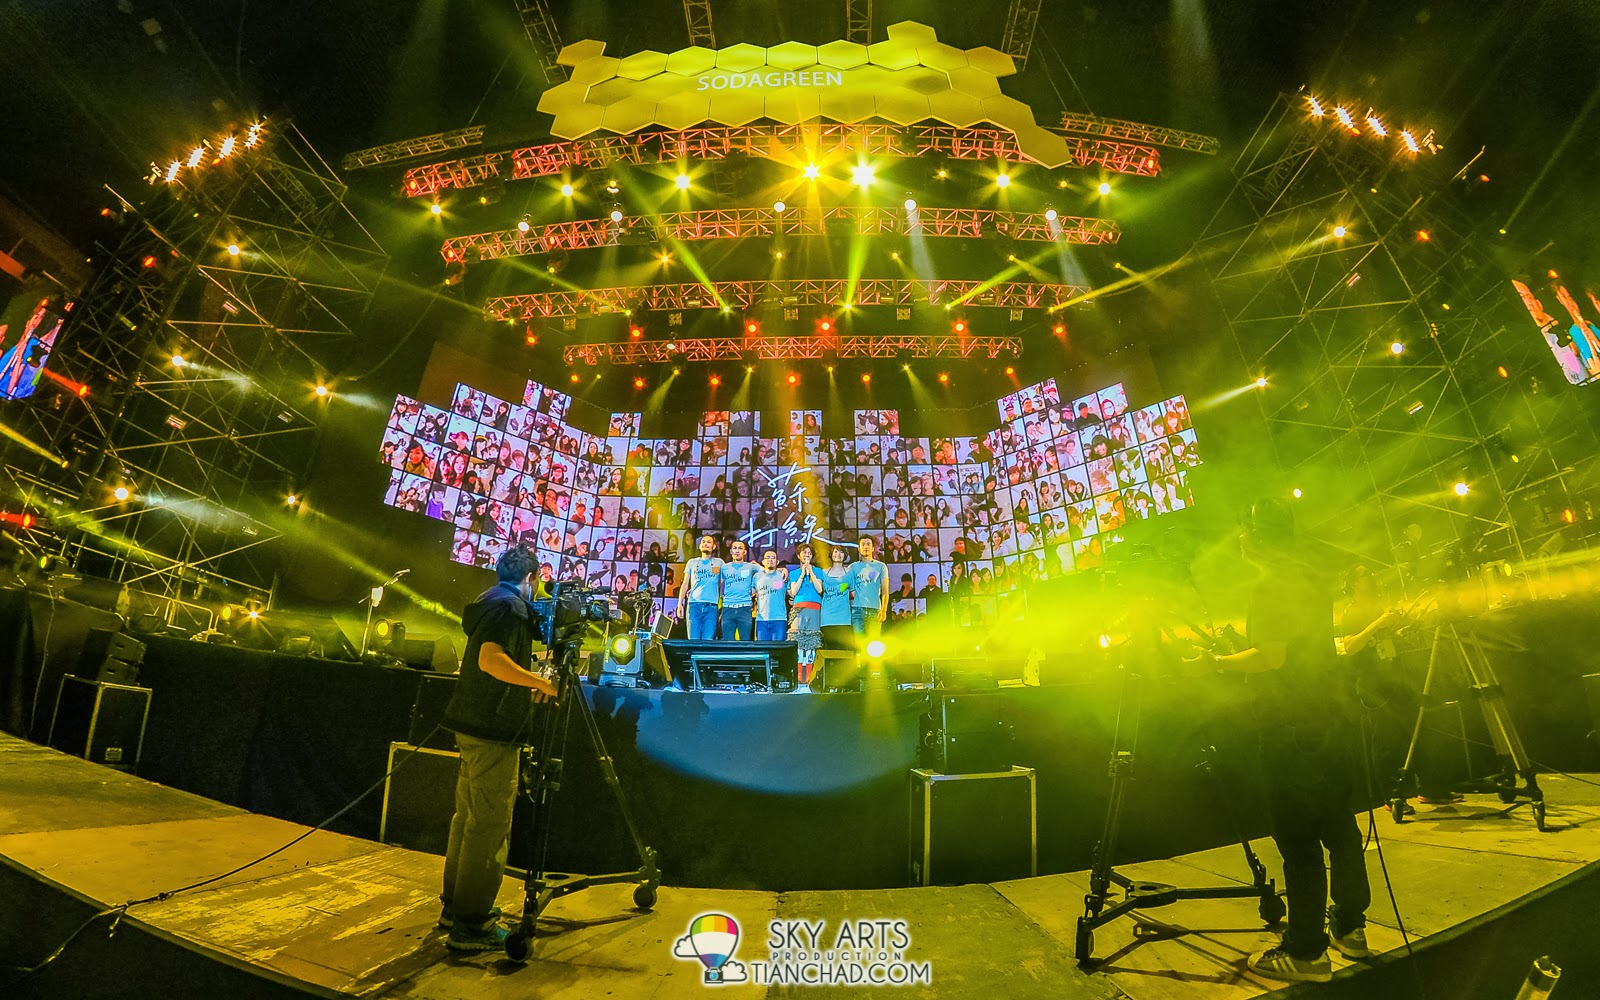 "苏打绿《当我们一起走过》巡回演唱会 - 吉隆坡站 Sodagreen ""Walk Together"" Tour Live in Kuala Lumpur 摄于3月1号 @ Putra Indoor Stadium"